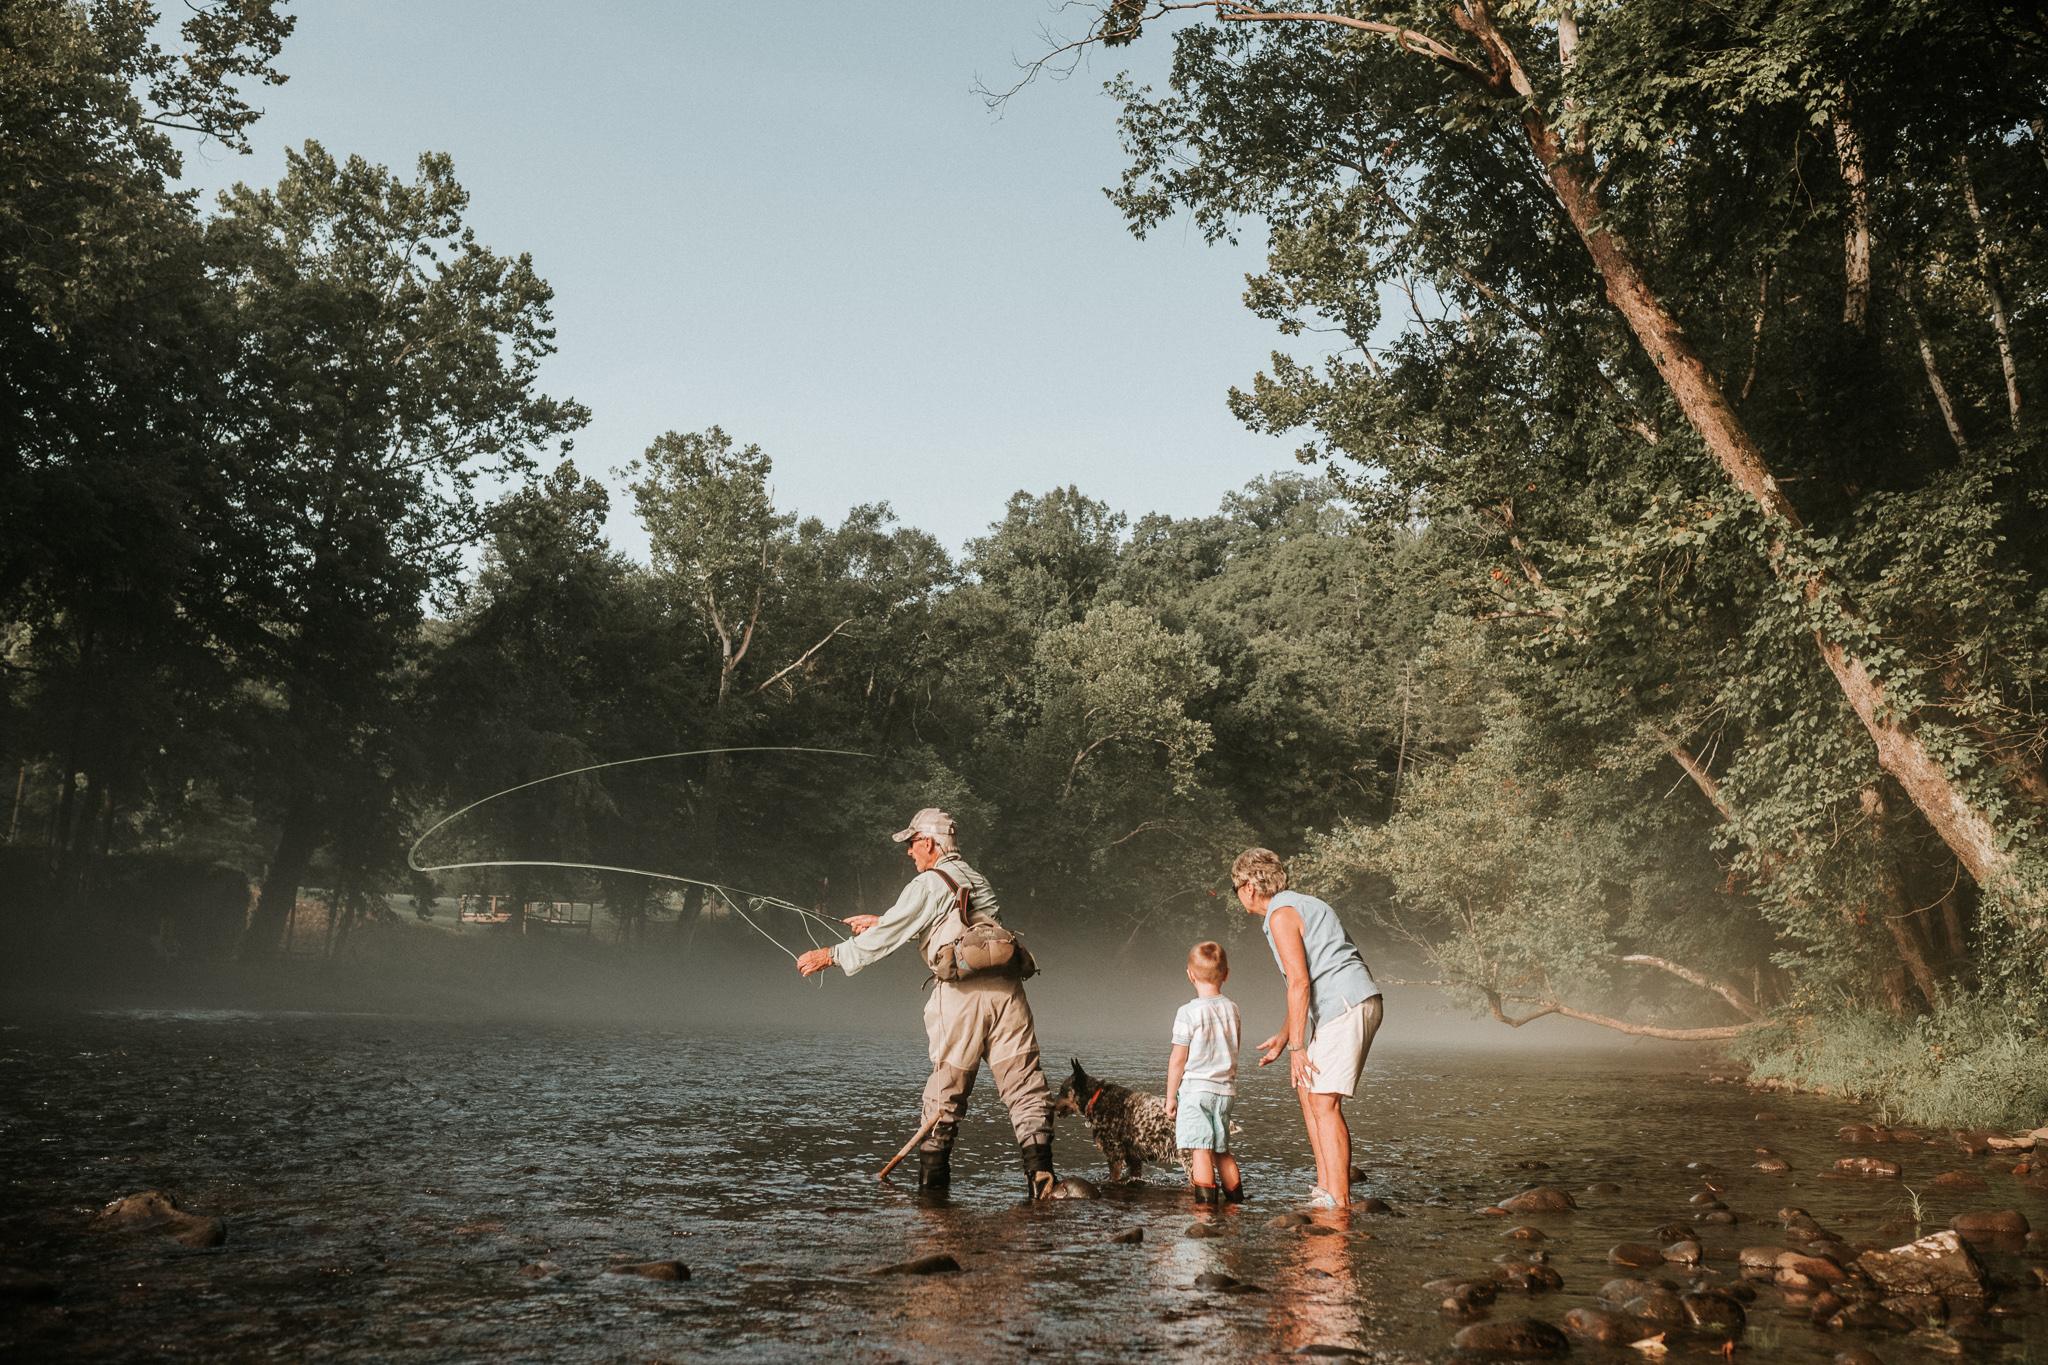 Fly fishing with Papaw and Mamaw | Watauga, TN